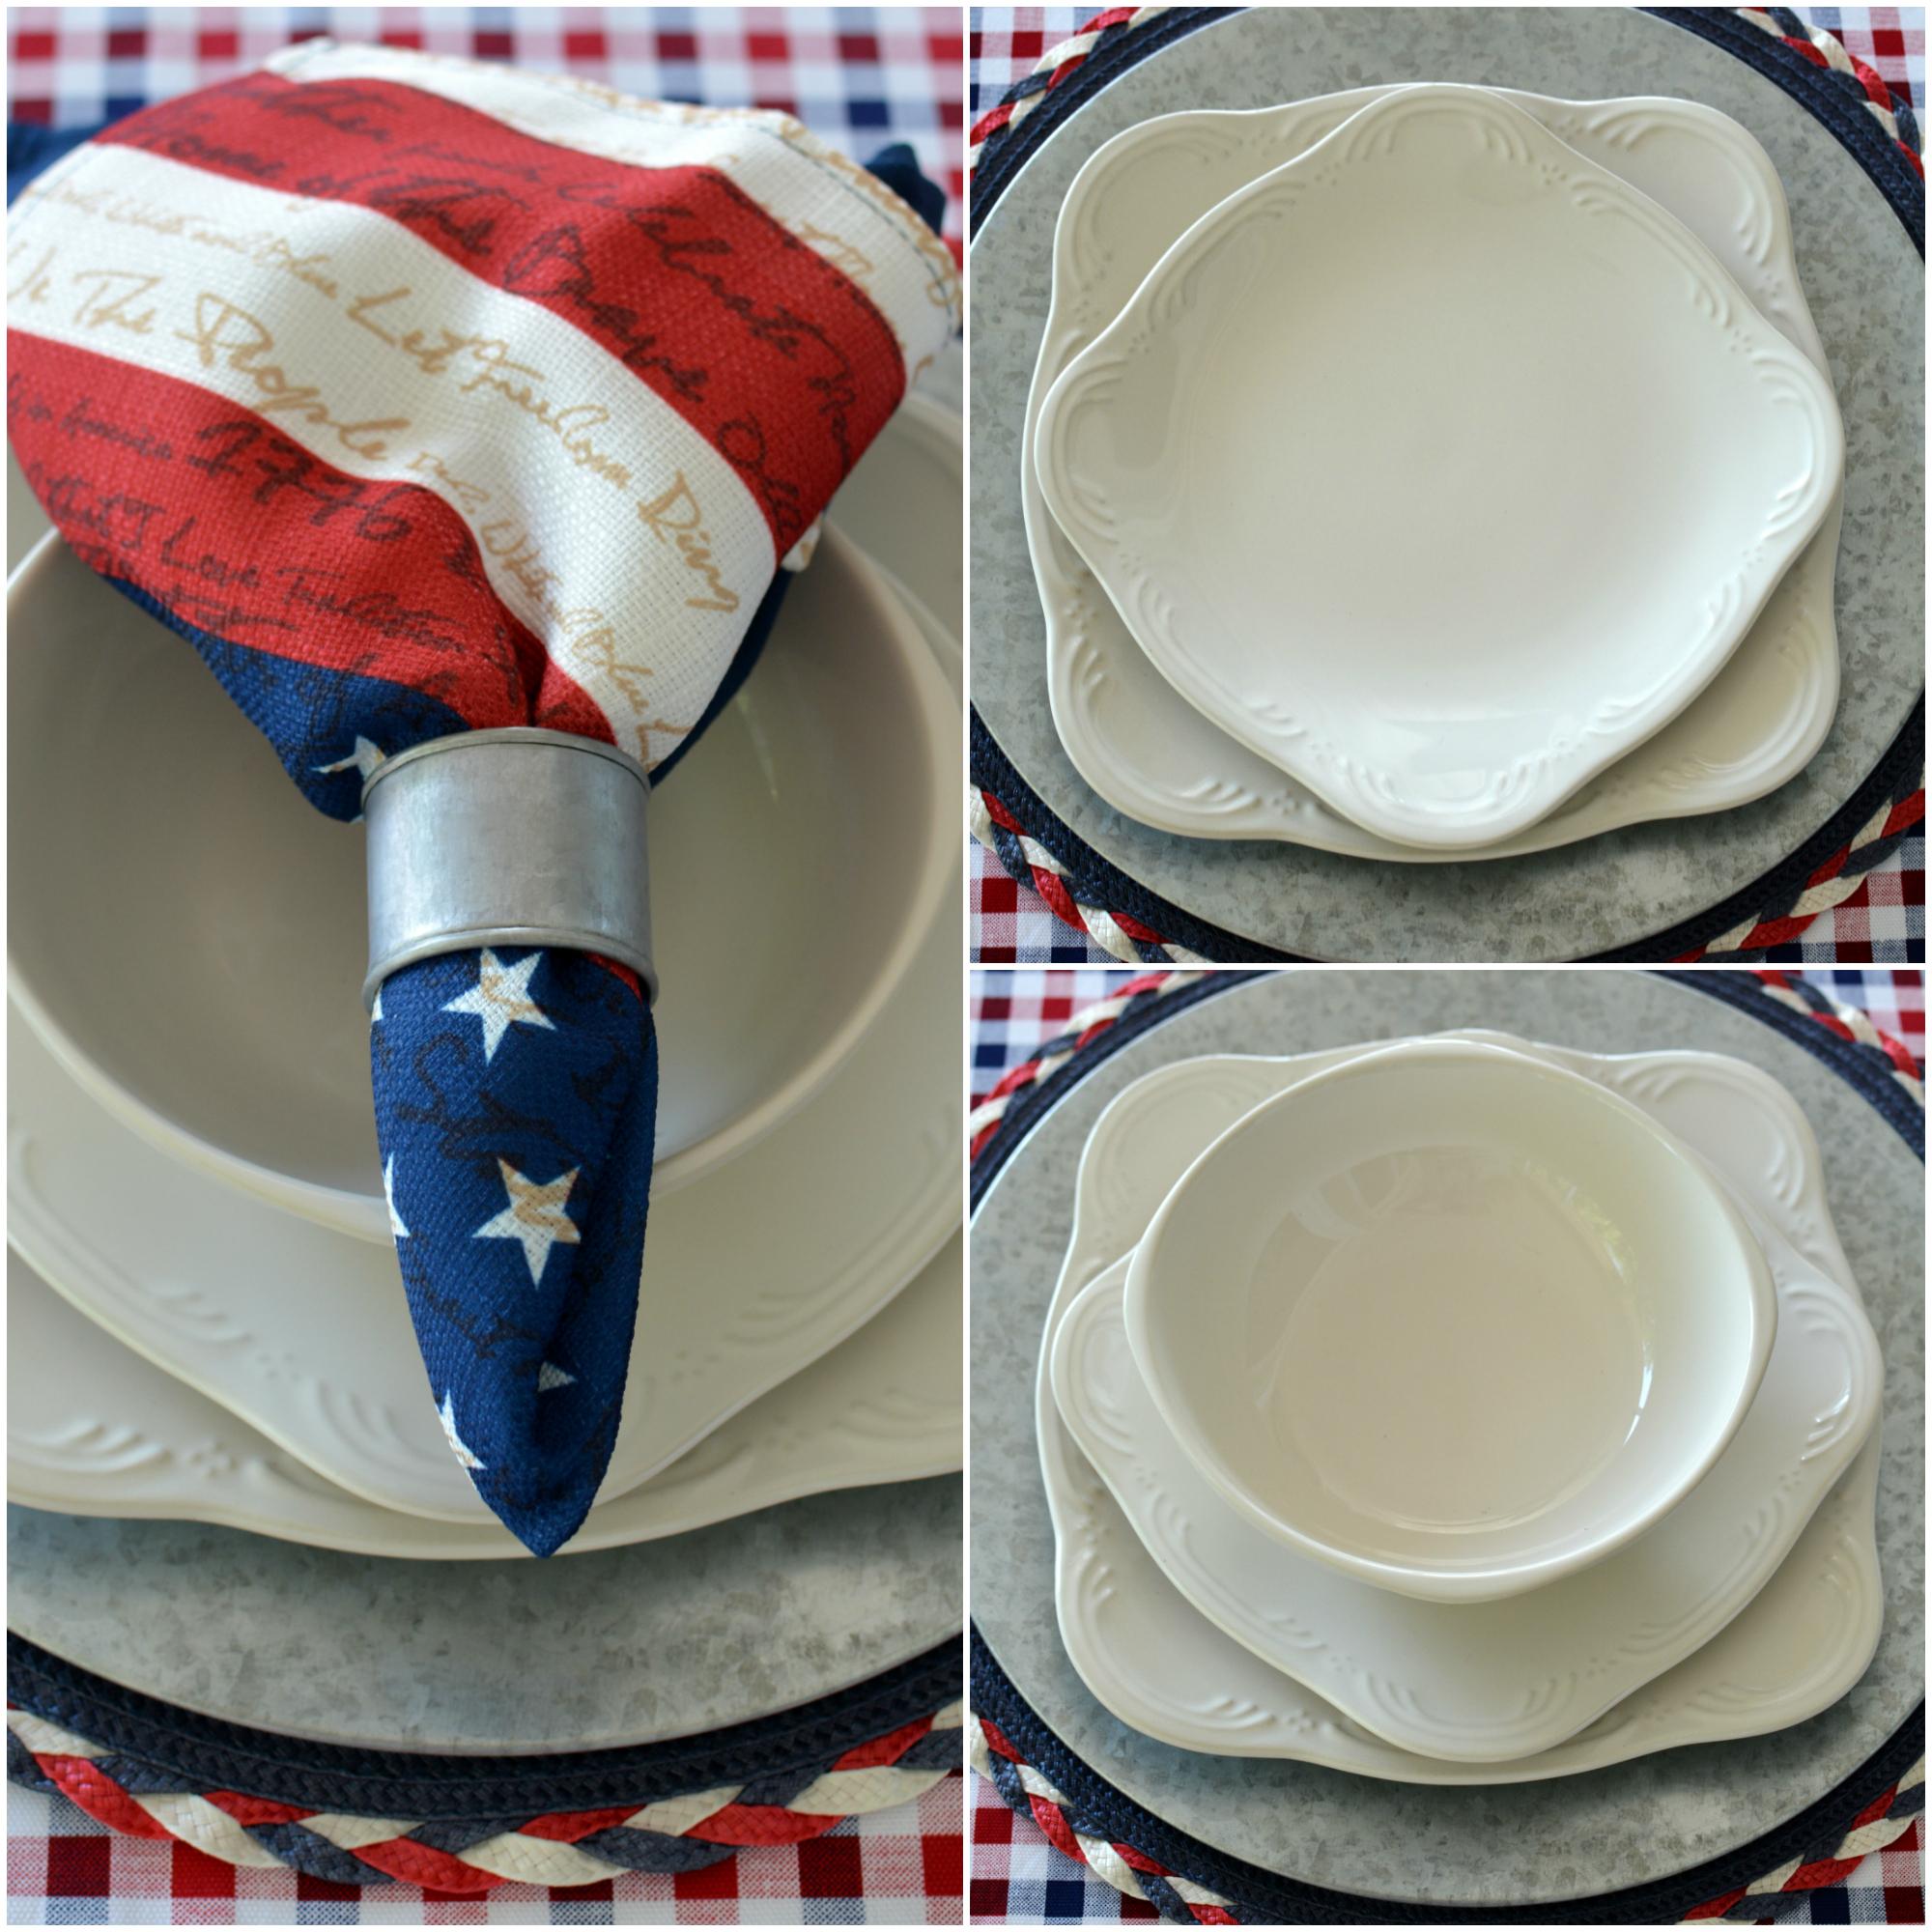 Pfaltzgraff Filligree & Celebrate the Red White and Boom Patriotic Table with Pfaltzgraff ...